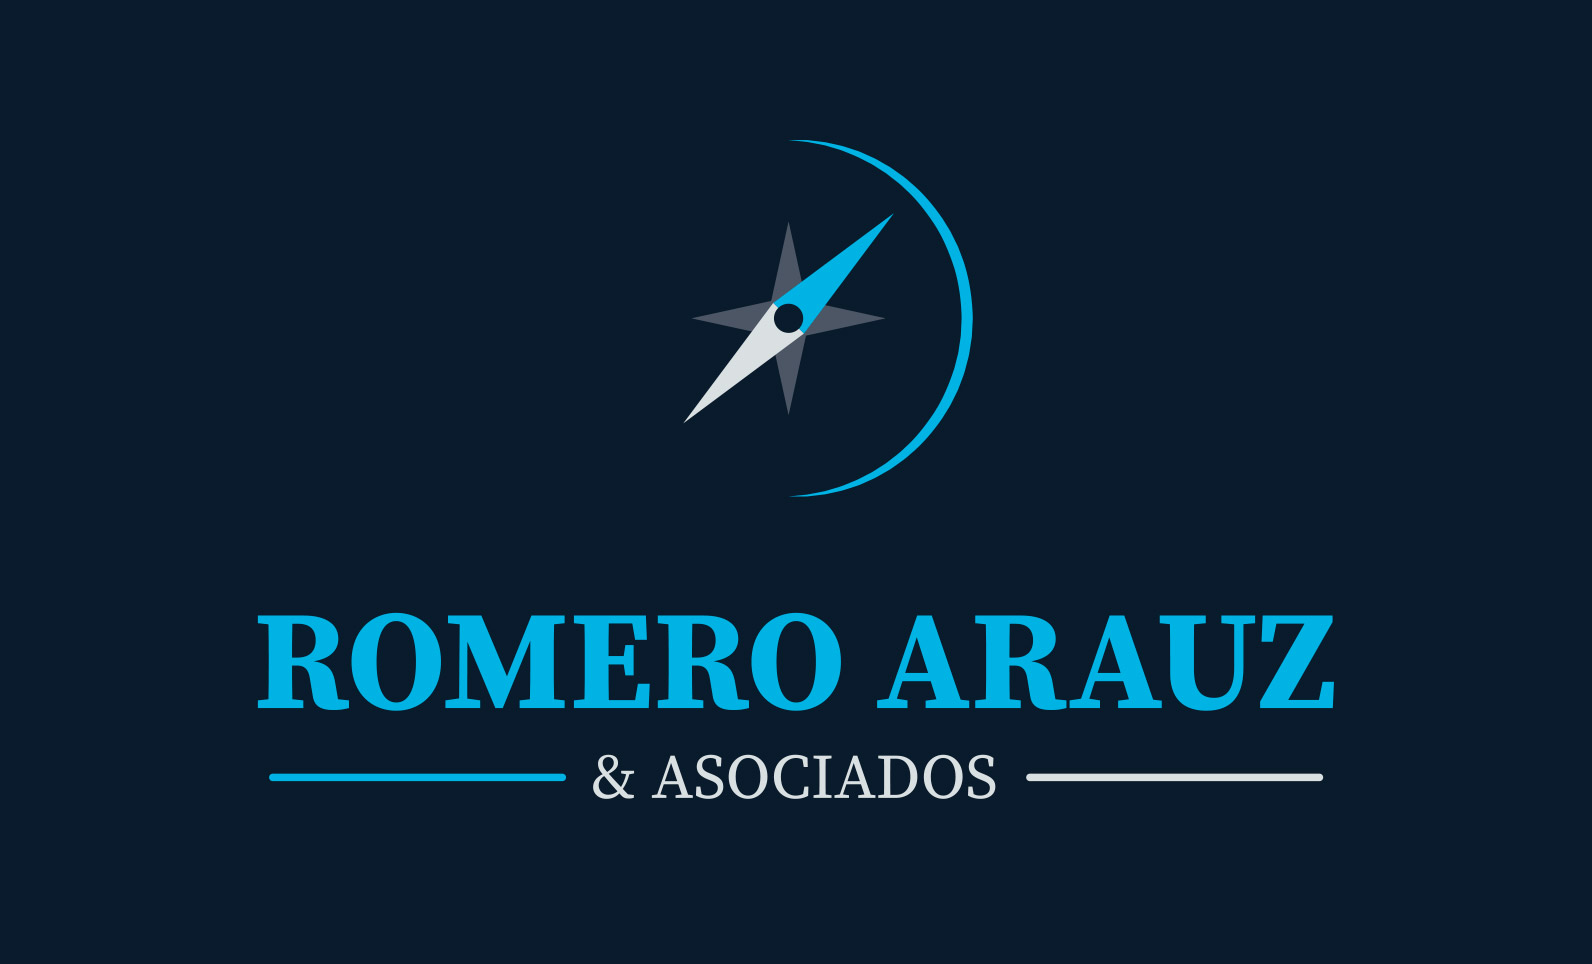 Romero Arauz